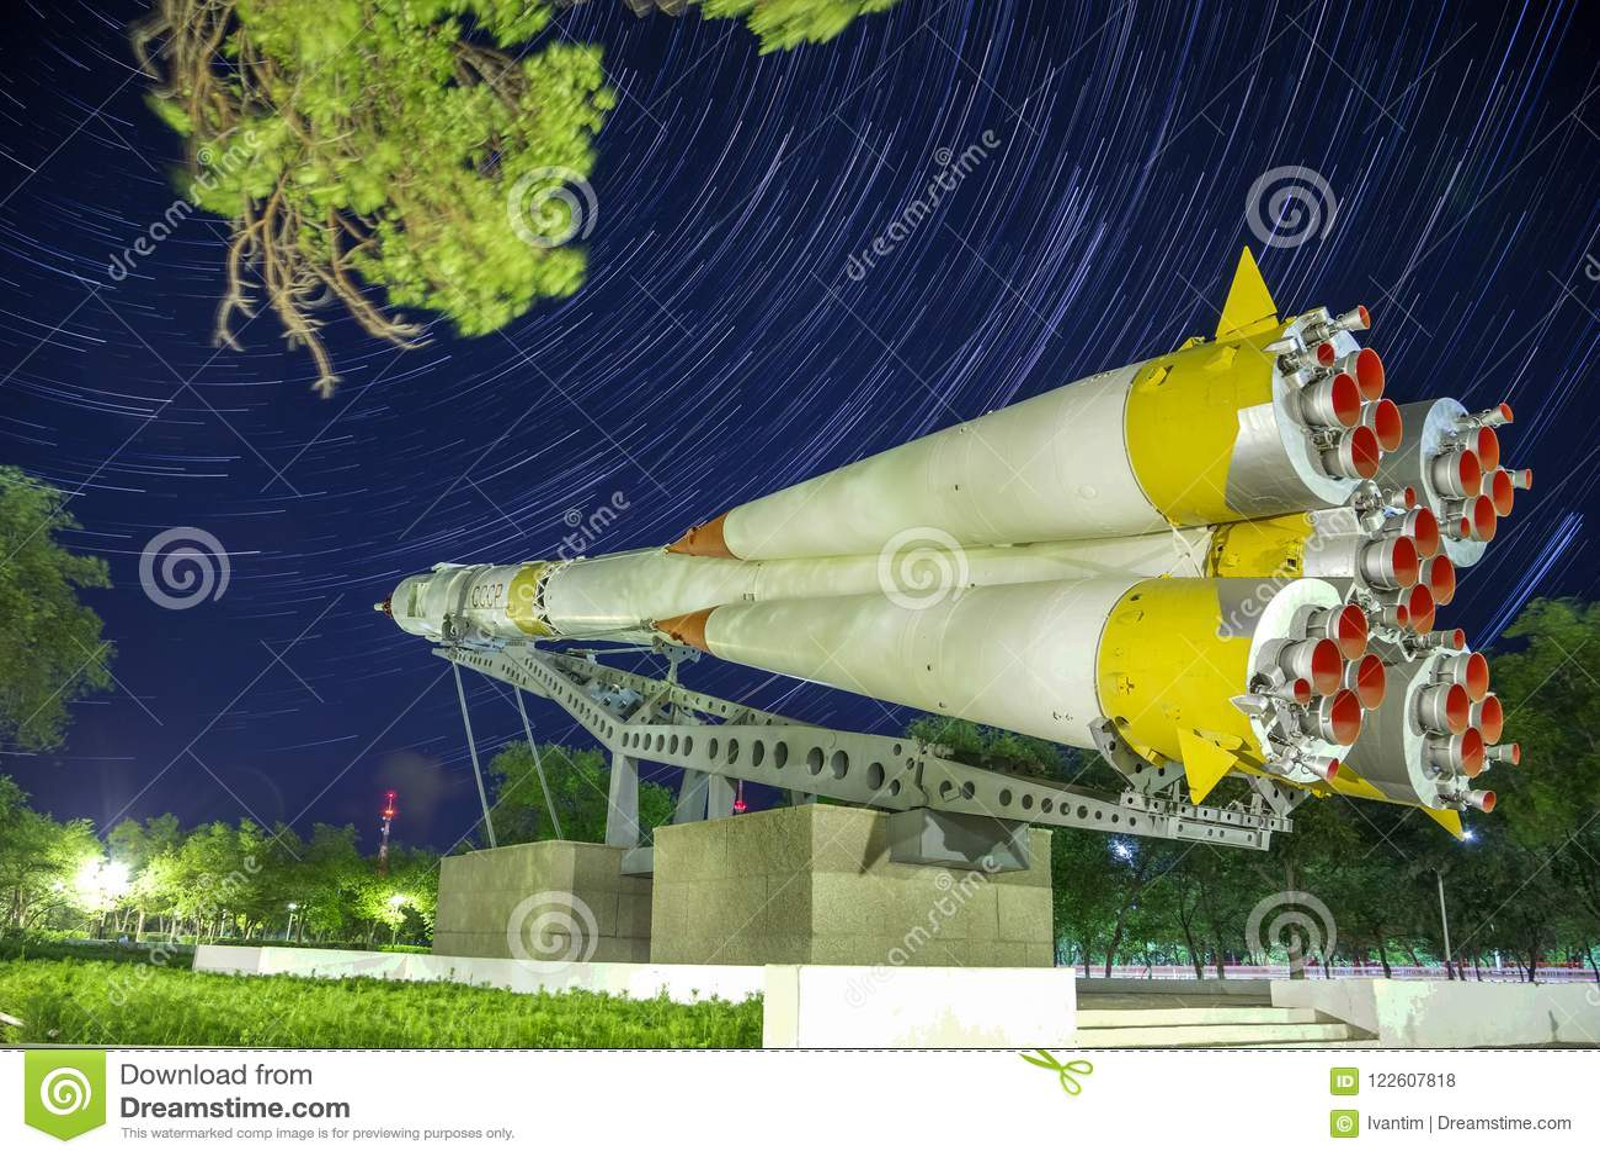 Monument to the Soyuz rocket. Startrails background.